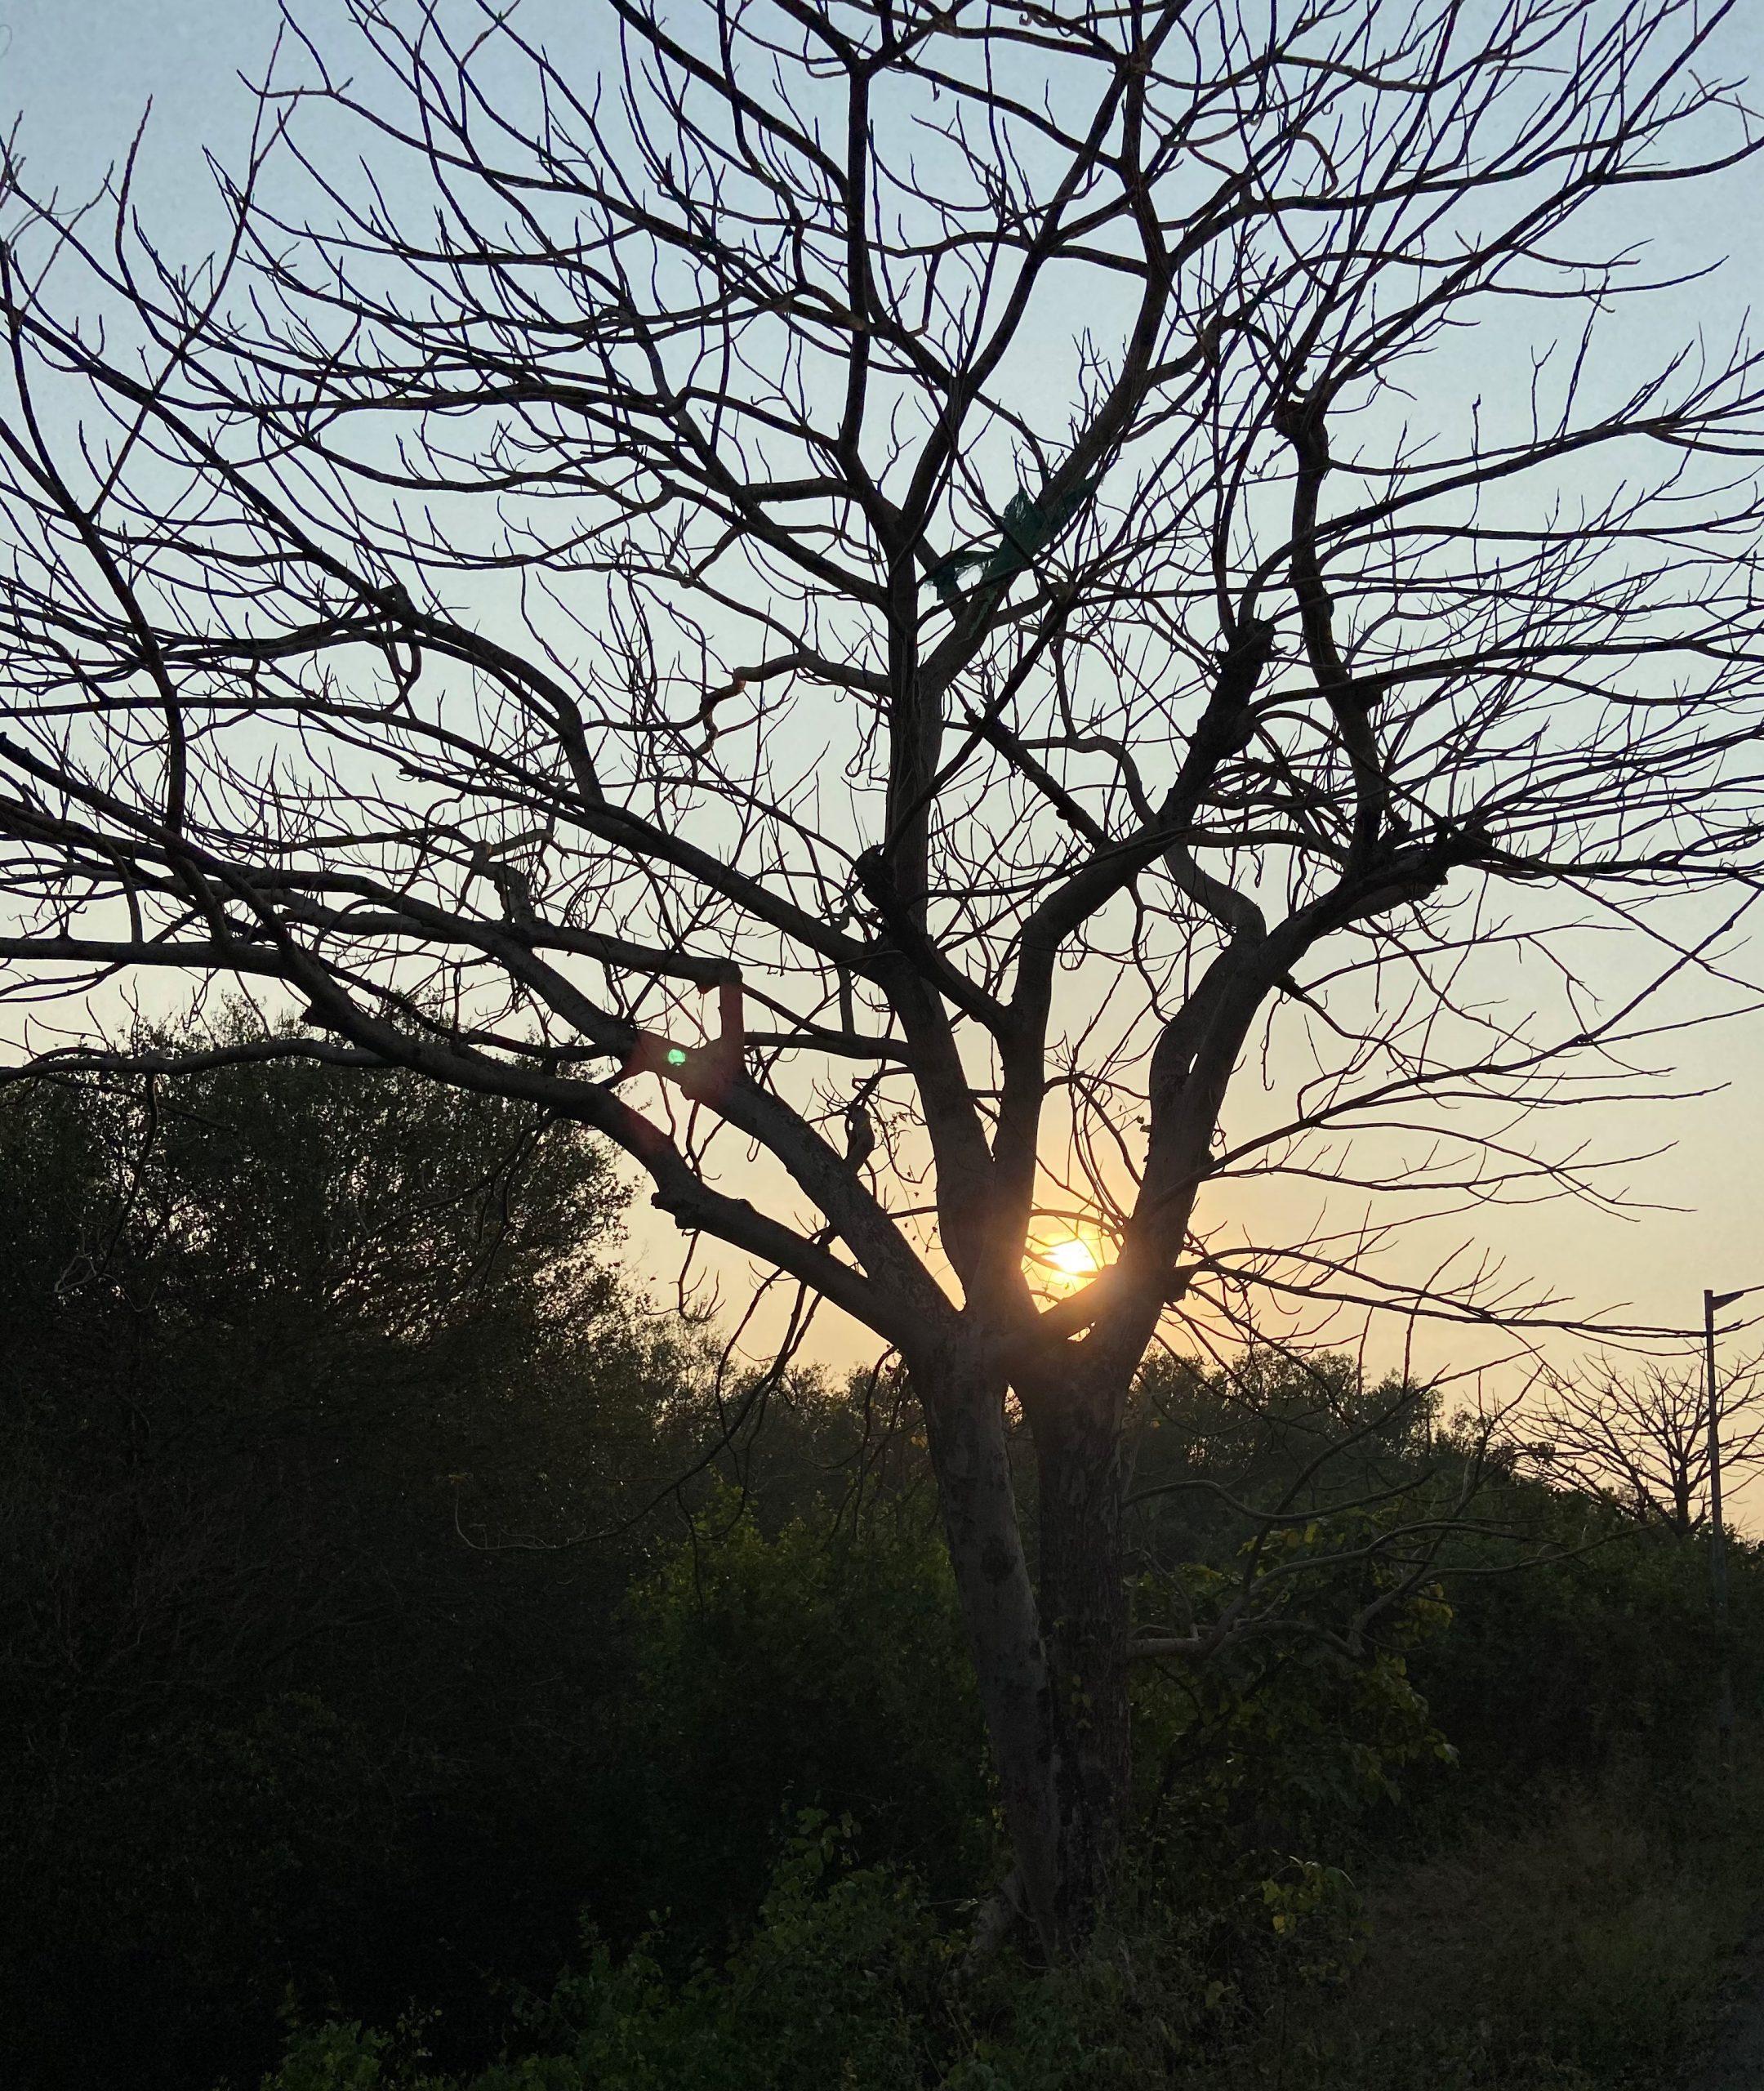 Sunset through a tree